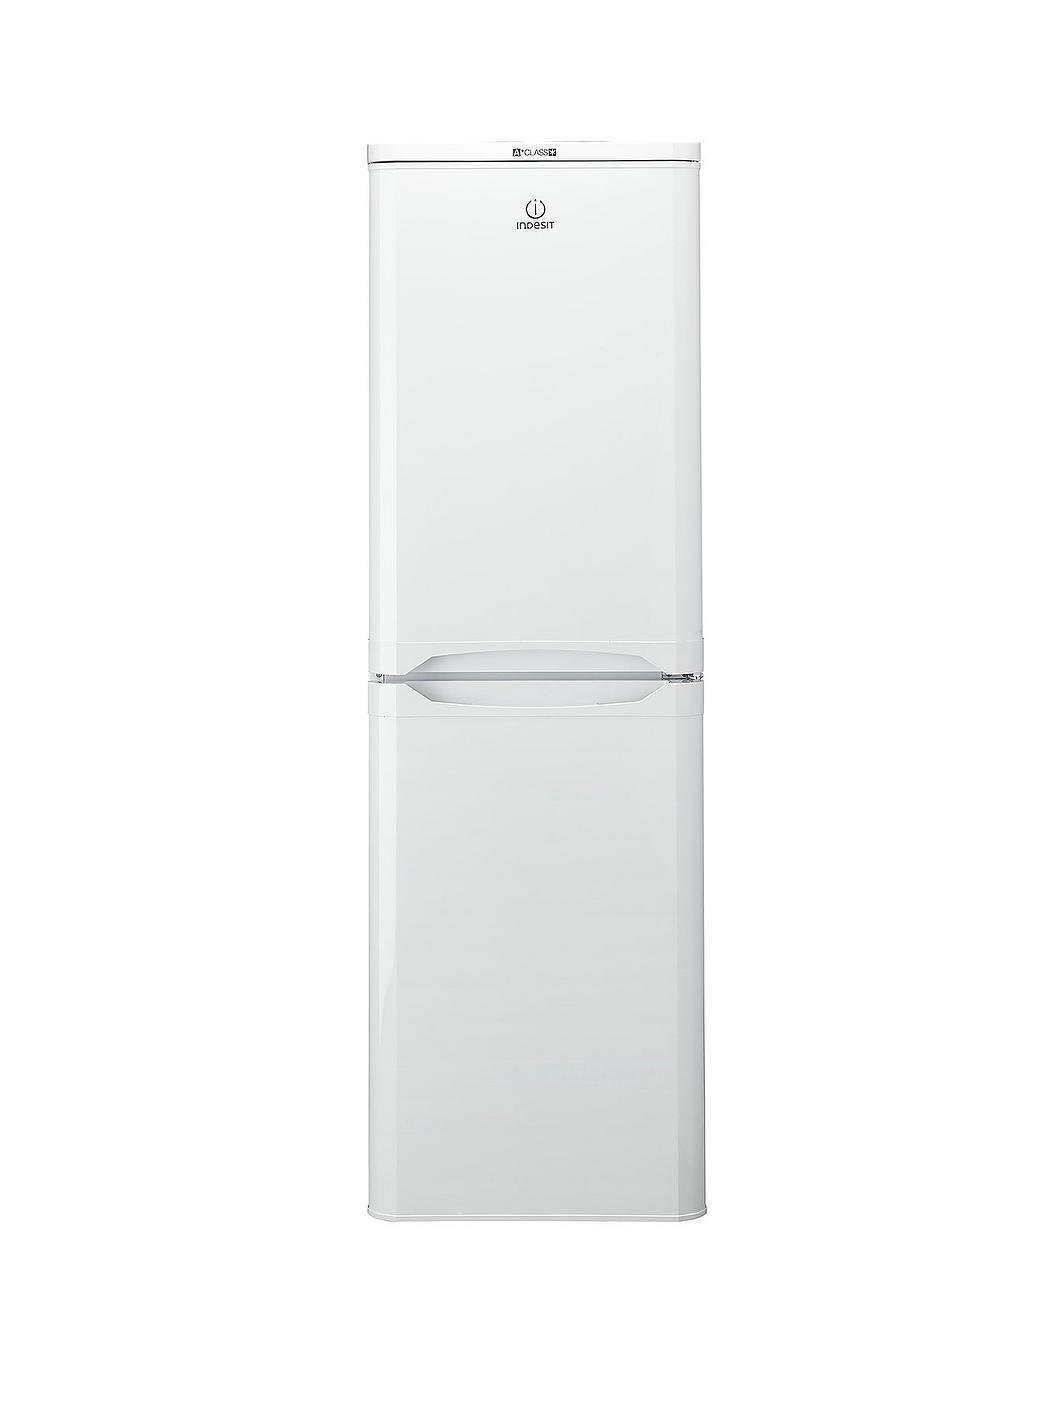 indesit caa55 55 cm fridge freezer white. Black Bedroom Furniture Sets. Home Design Ideas